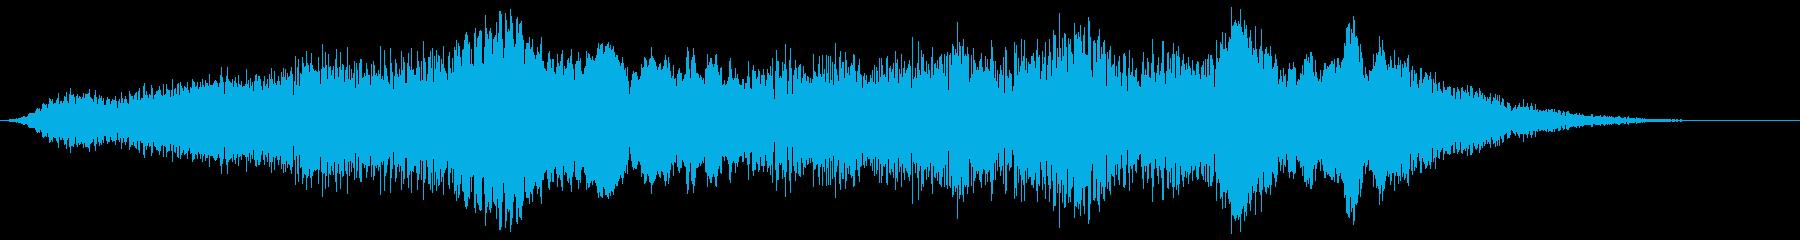 LFE付きベッド地球外脈動パスの再生済みの波形